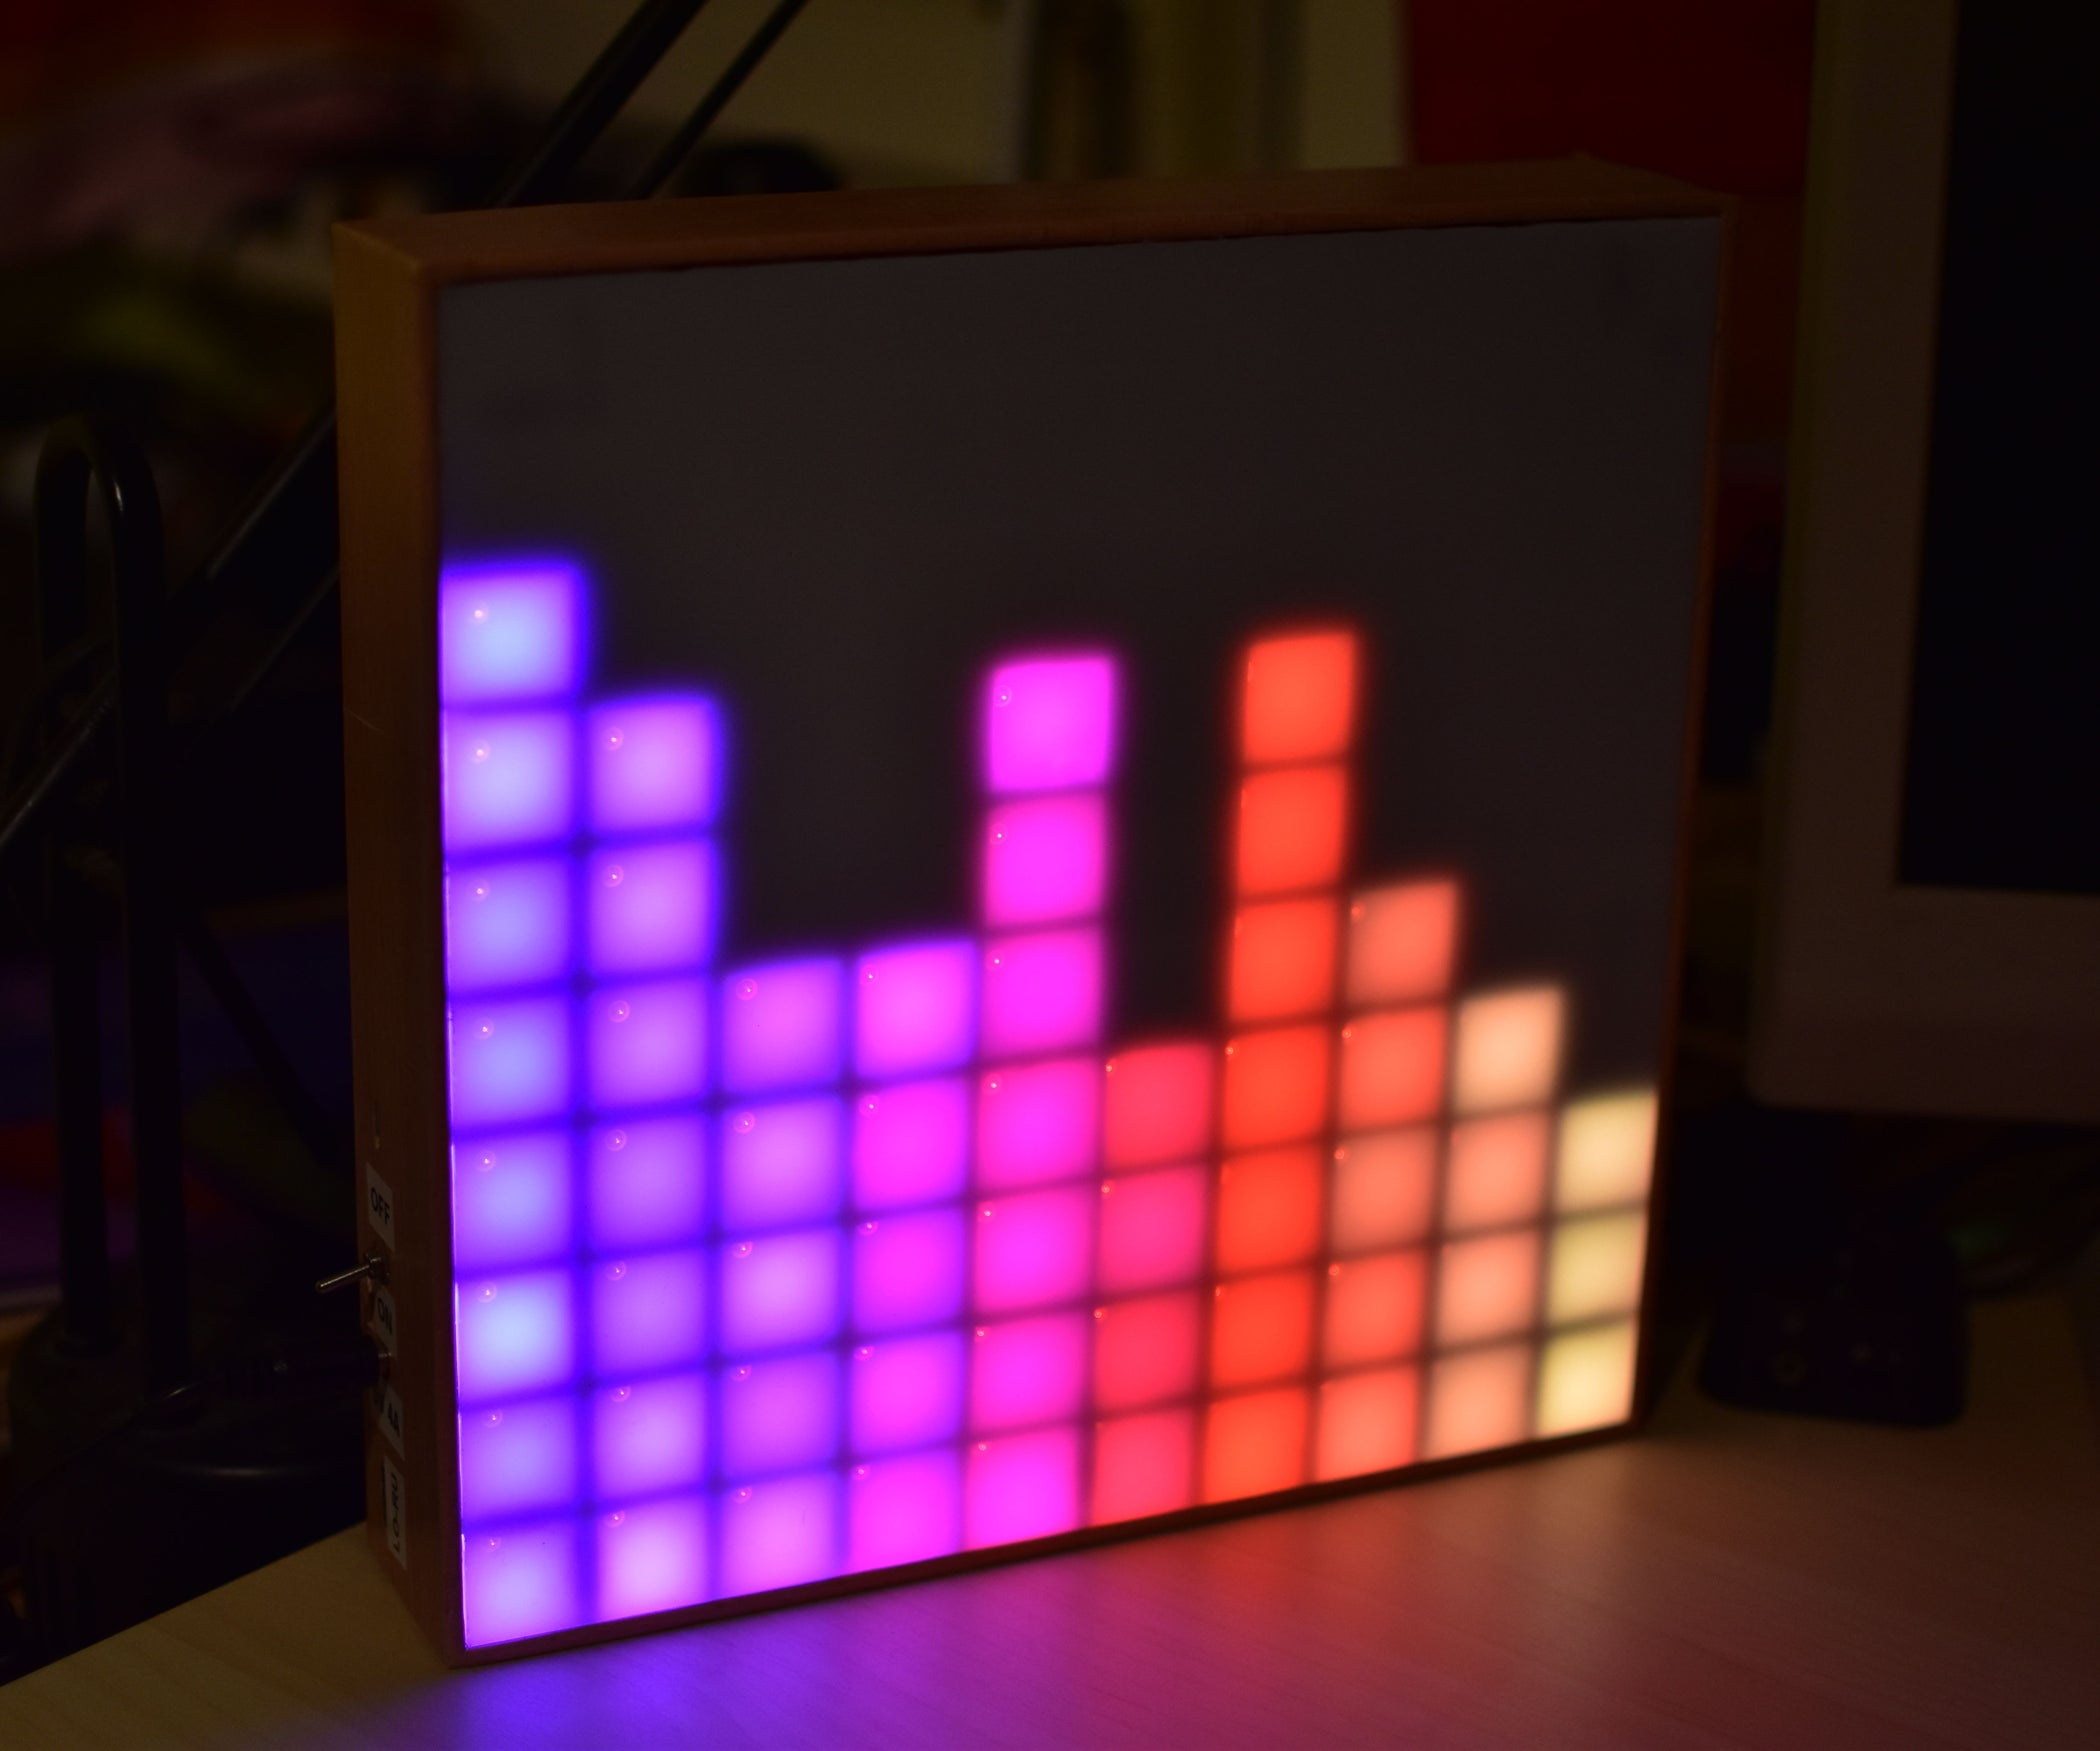 Turning Lights Homemade 10Band Spectrum Analyzer — Rosefloristvacaville